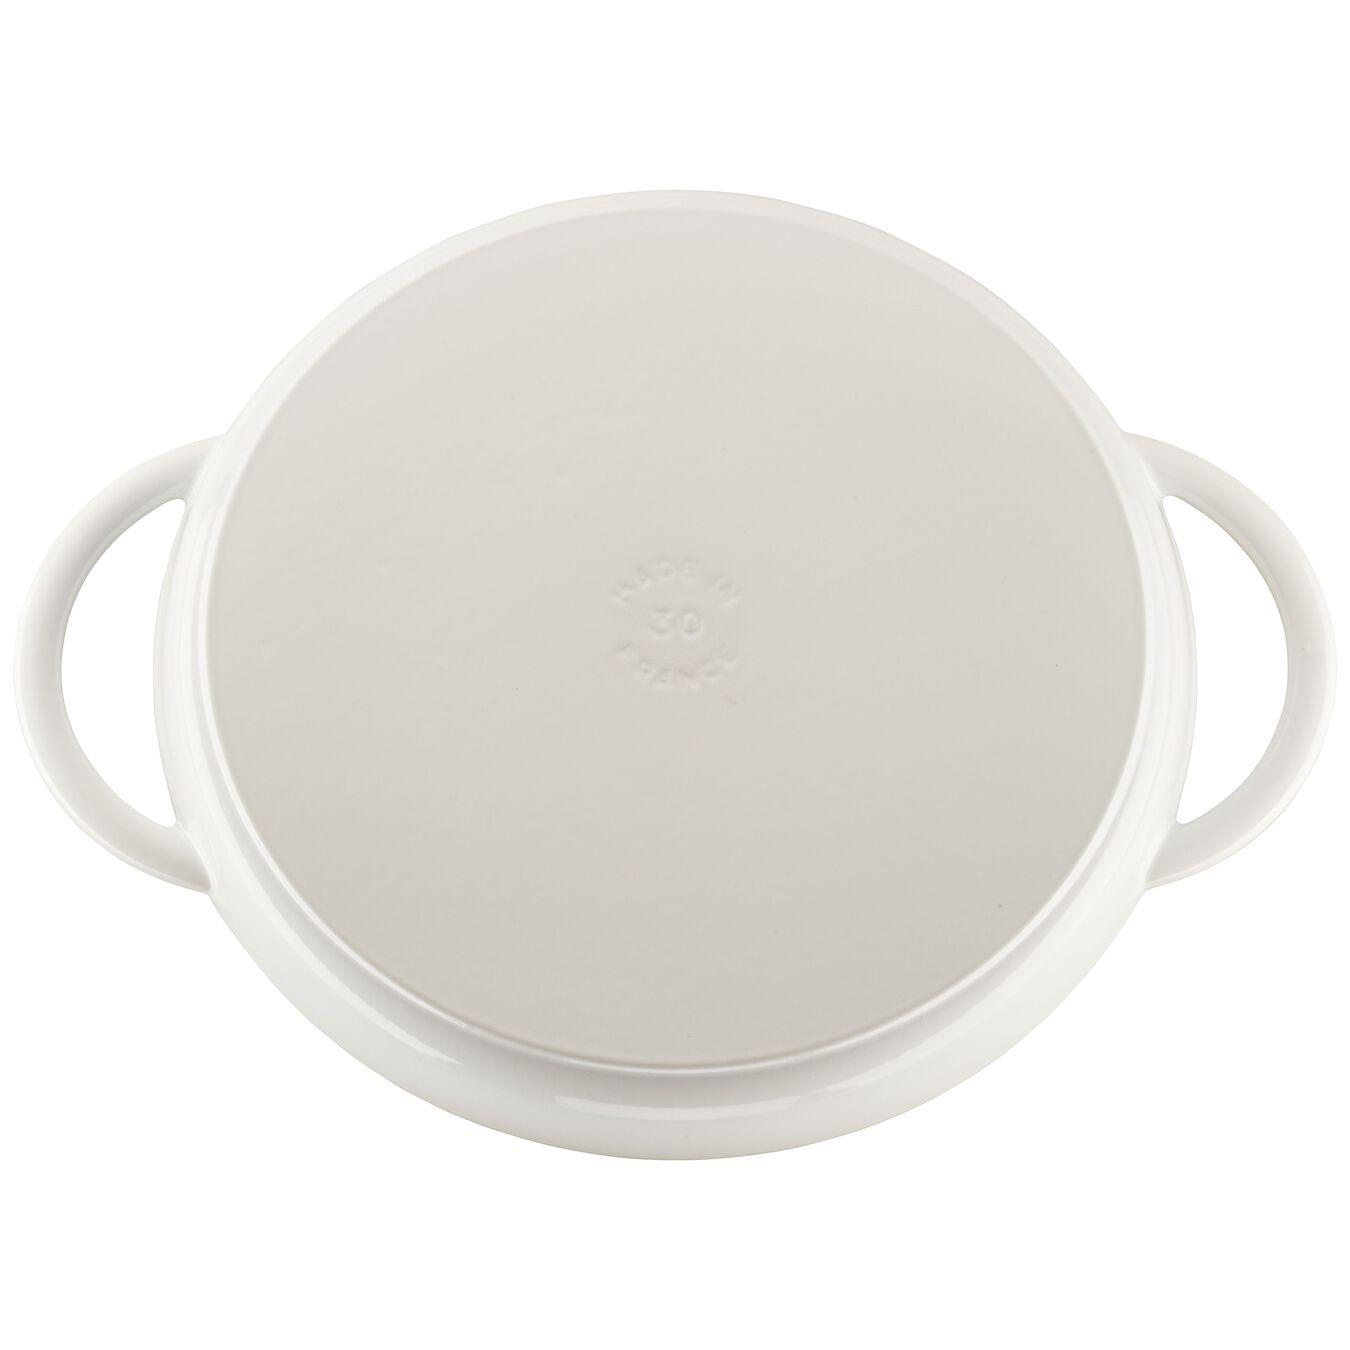 12-inch Round Steam Grill - White,,large 2